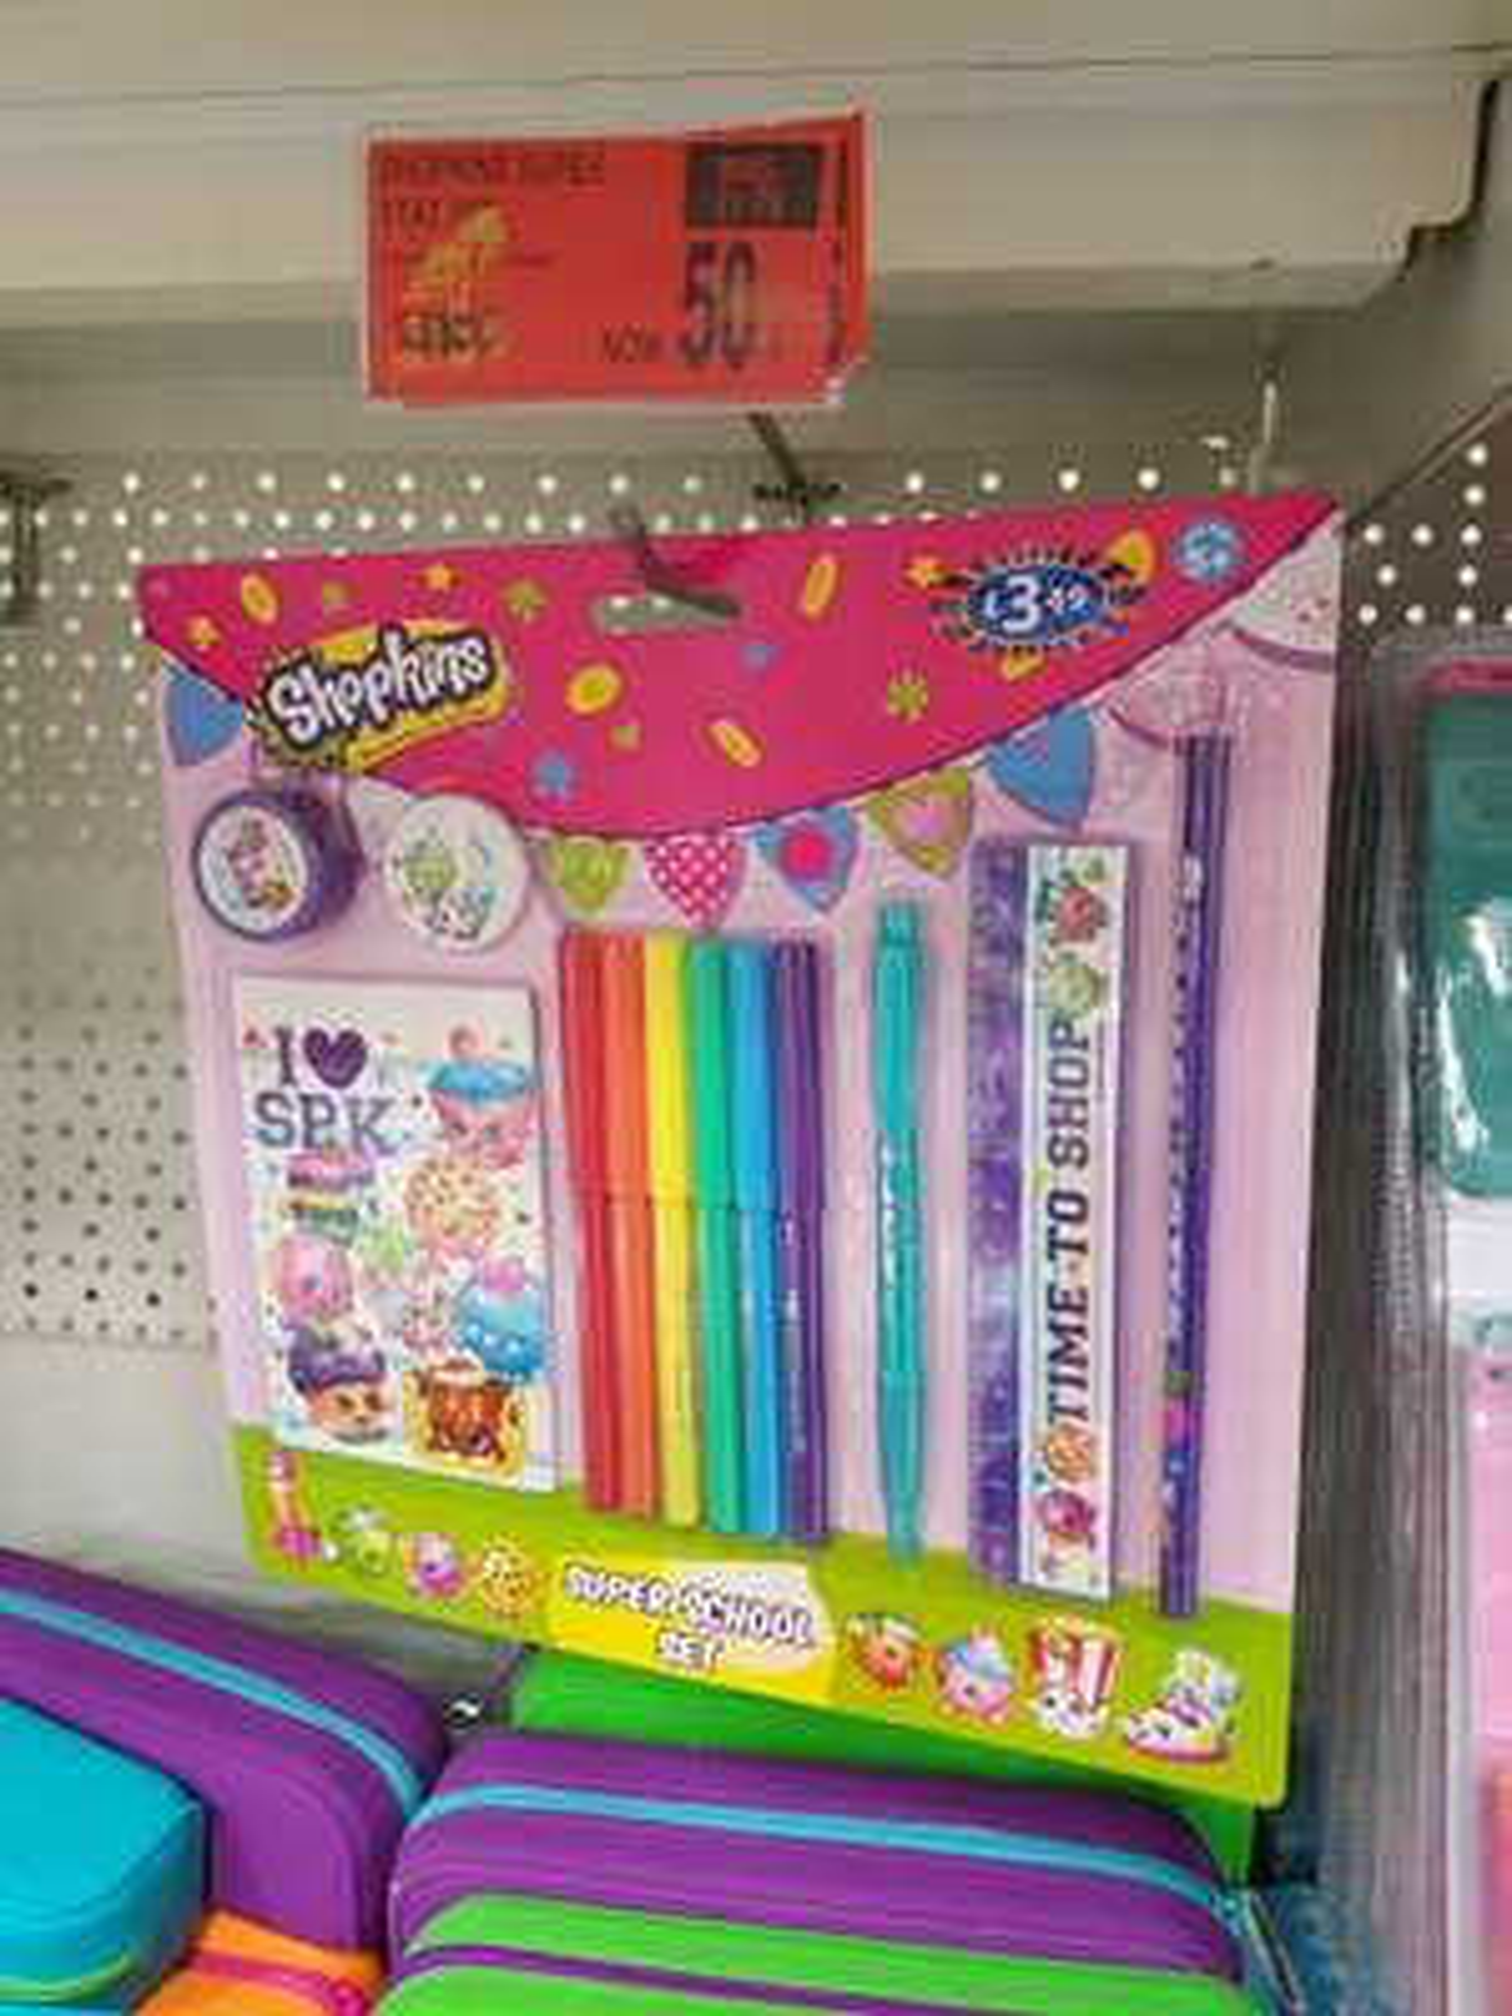 Shopkins super stationery set 50p @ B&M